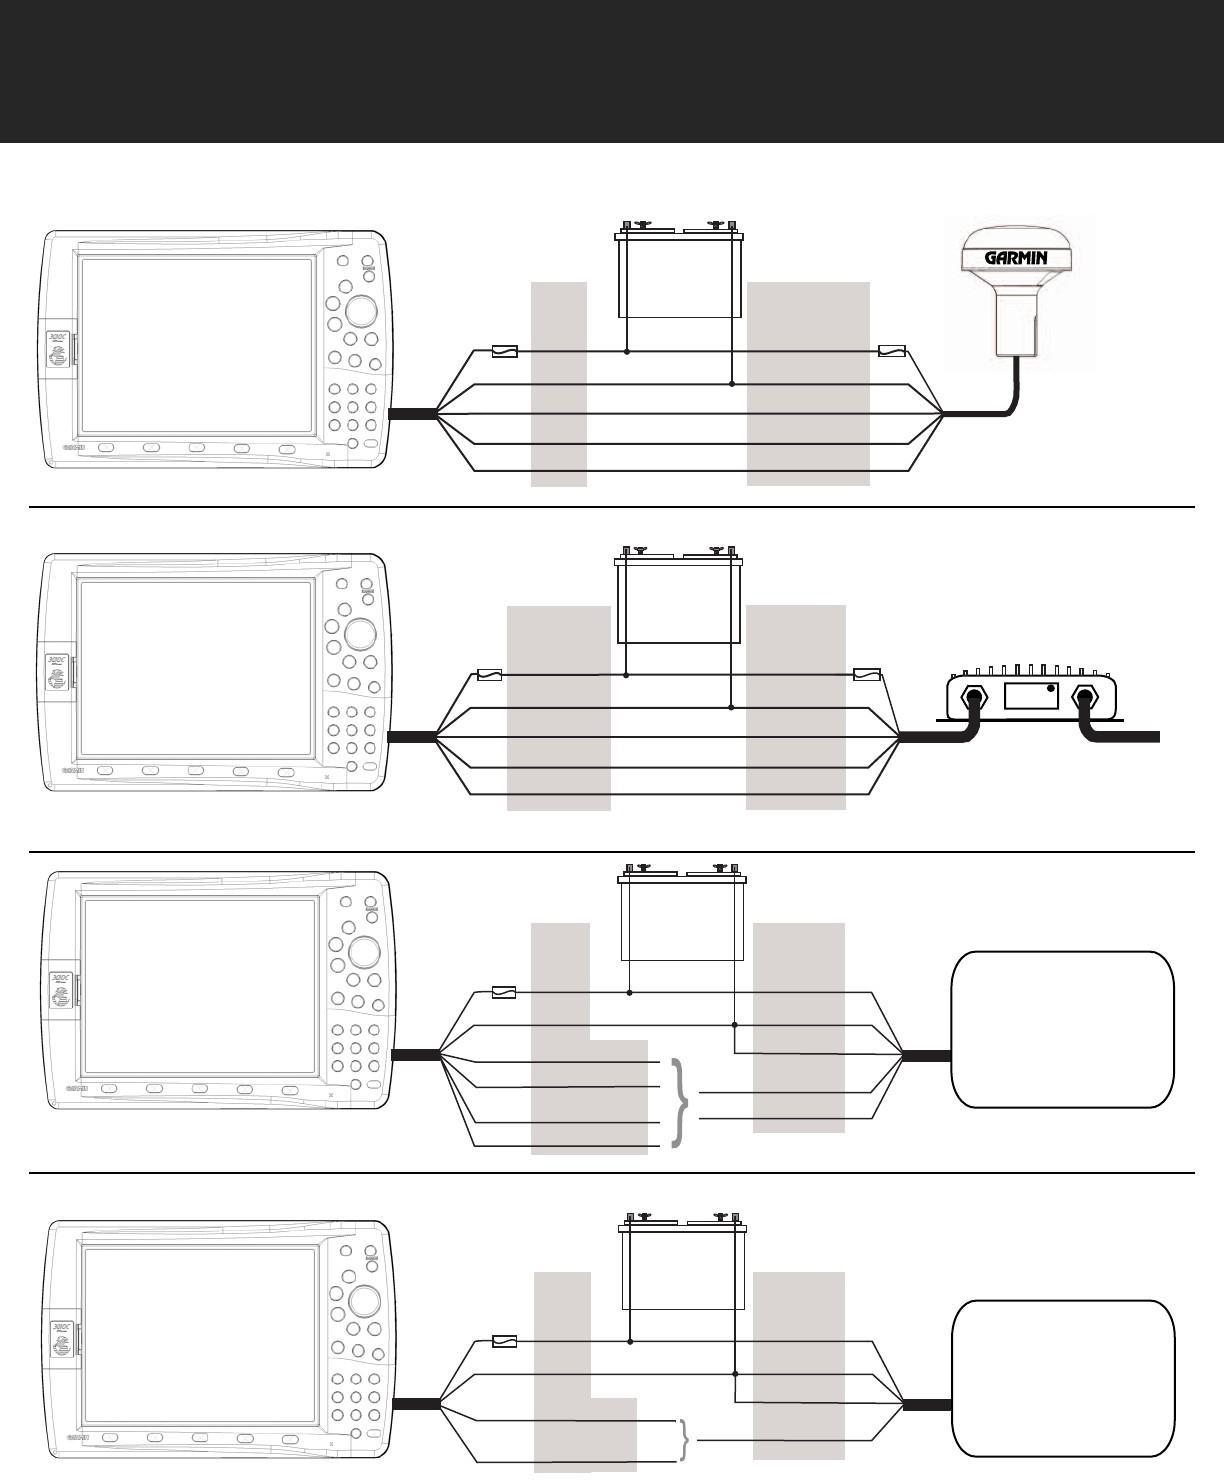 Garmin Nmea 0183 Wiring Diagram Elegant | Wiring Diagram Image on